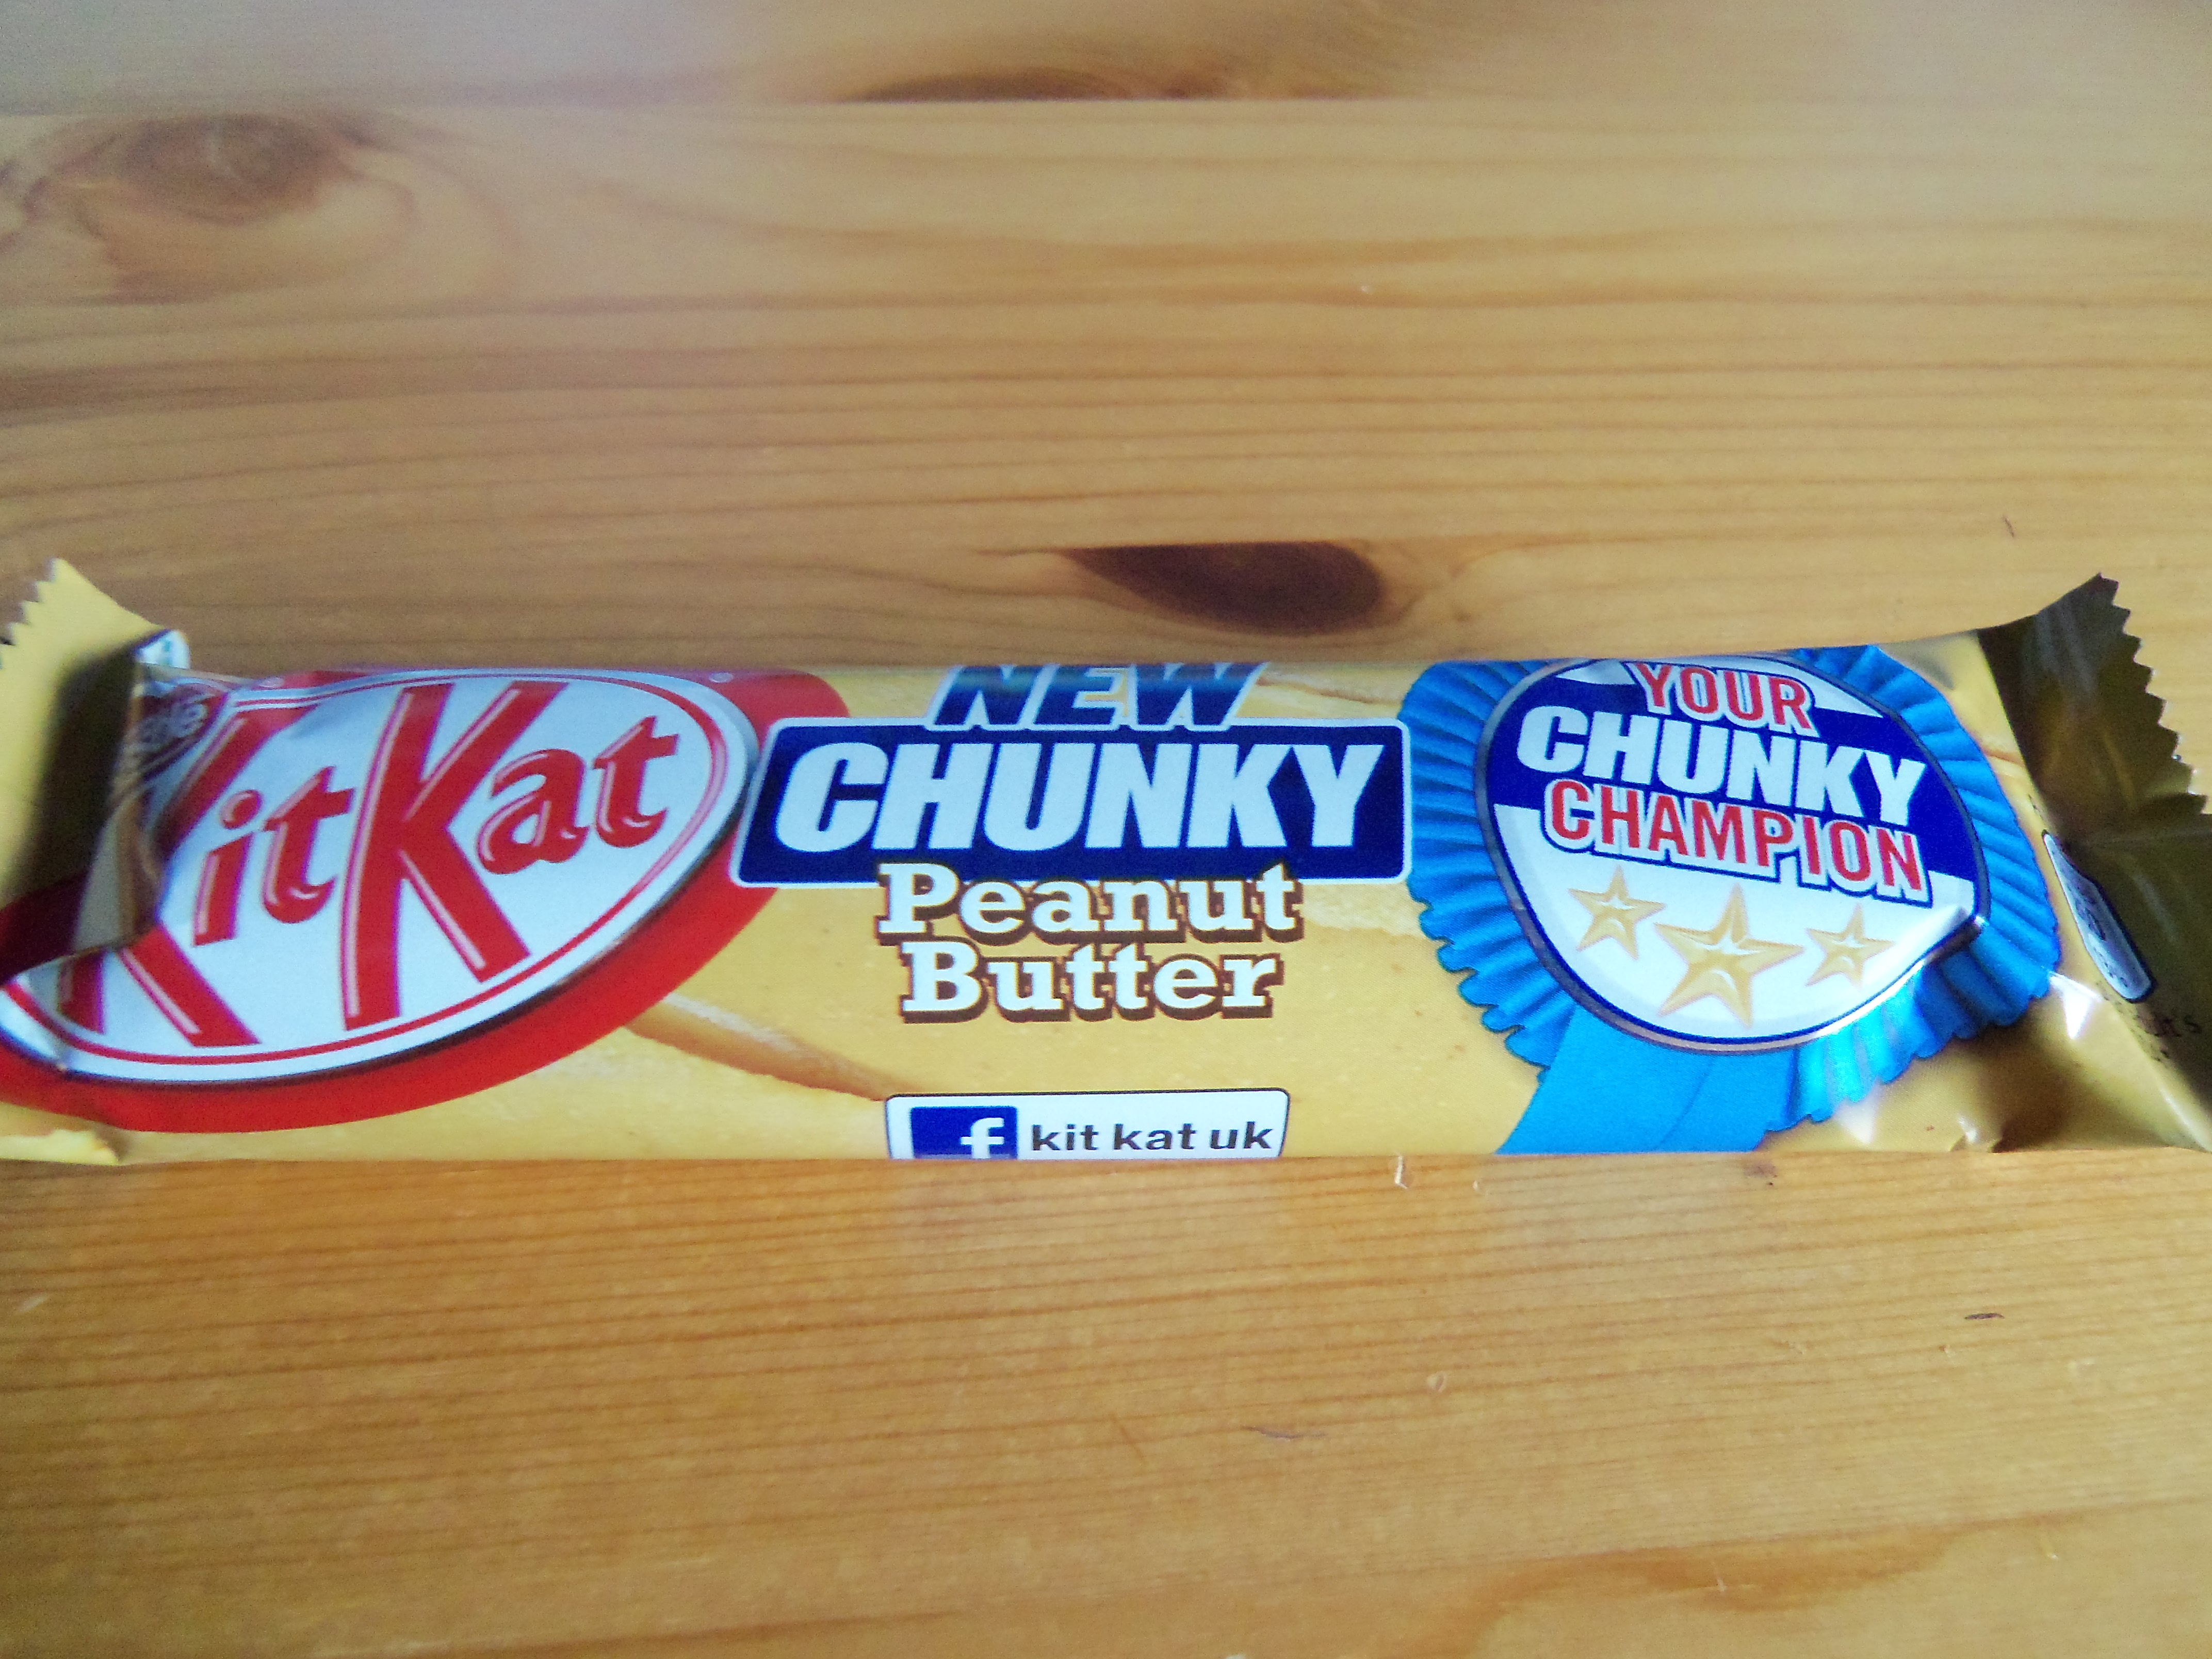 Nestle Kit Kat Chunky Peanut Butter | The Snack Review